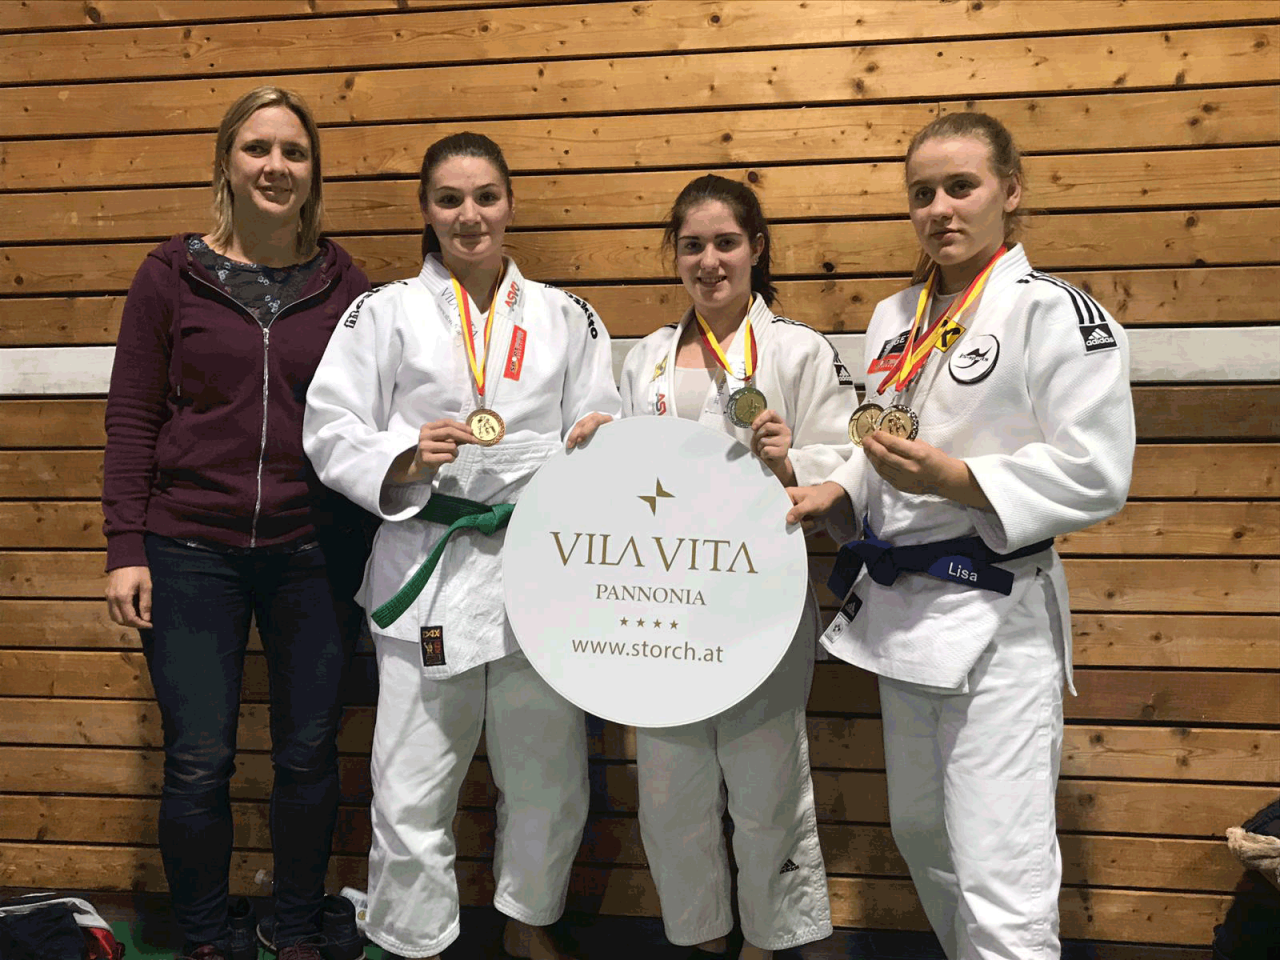 "Jiu-Jitsu-Club-""Vila-Vita-Pannonia""-Siegerinnen-1280x960.png"